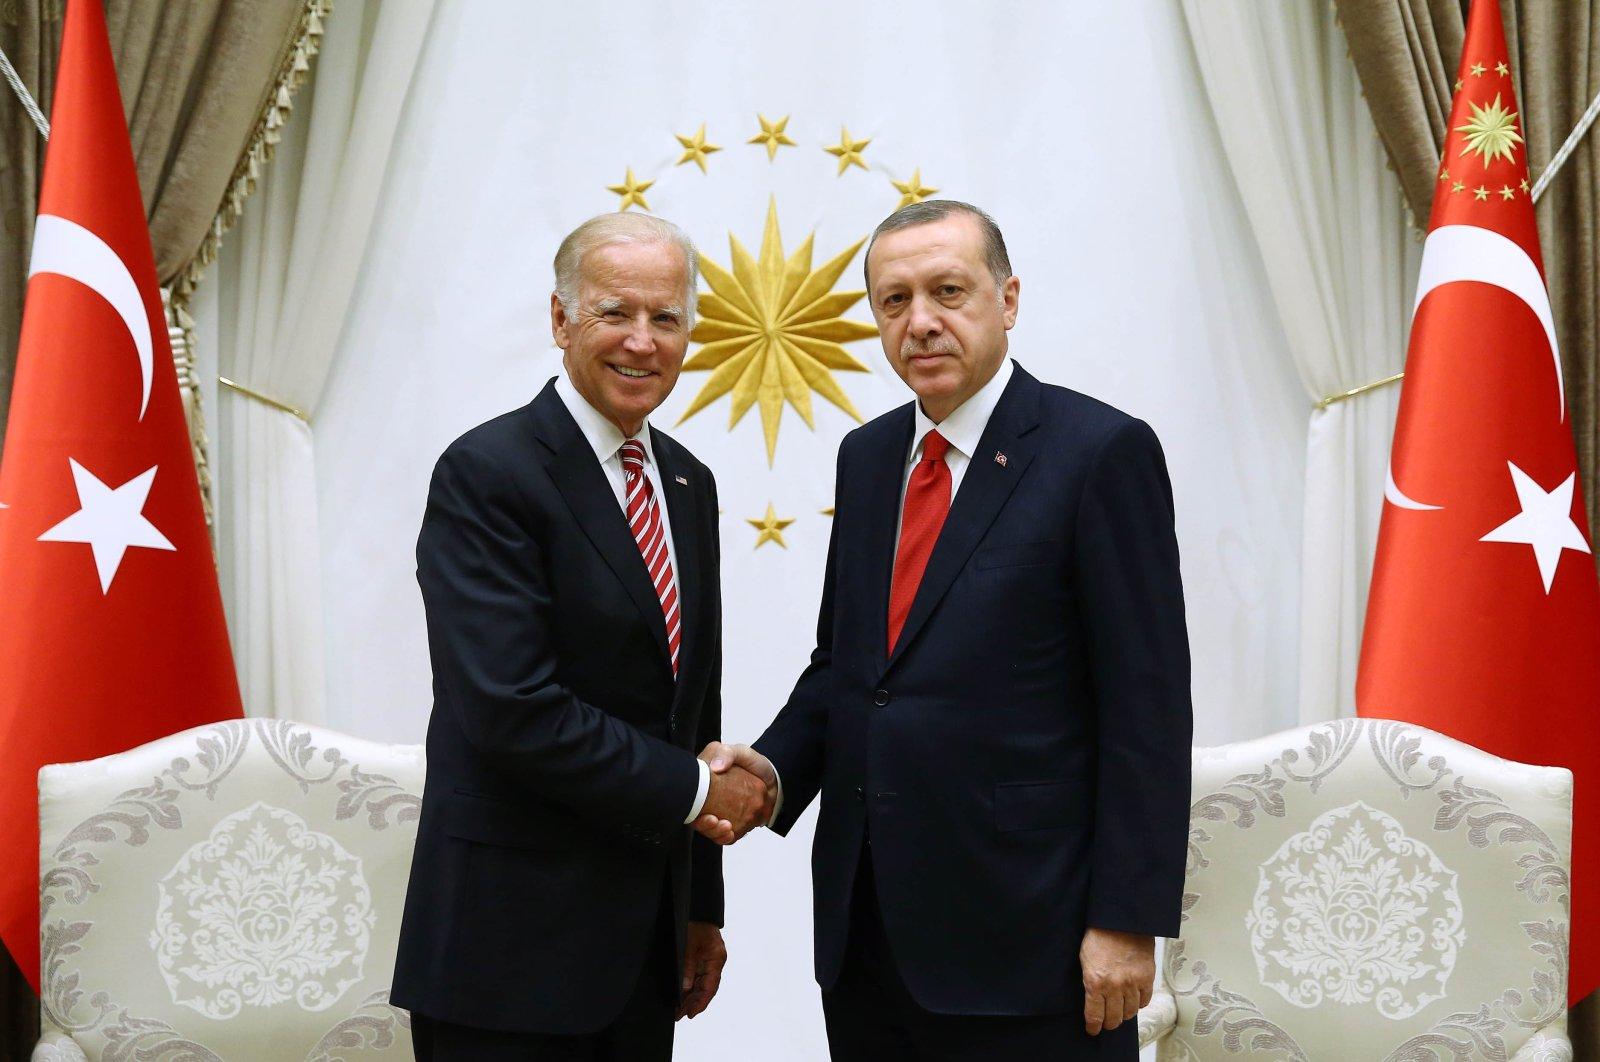 Then U.S. Vice President Joe Biden (L) and President Recep Tayyip Erdoğan during a meeting in the capital Ankara, Turkey, Aug. 24, 2016. (AA File Photo)